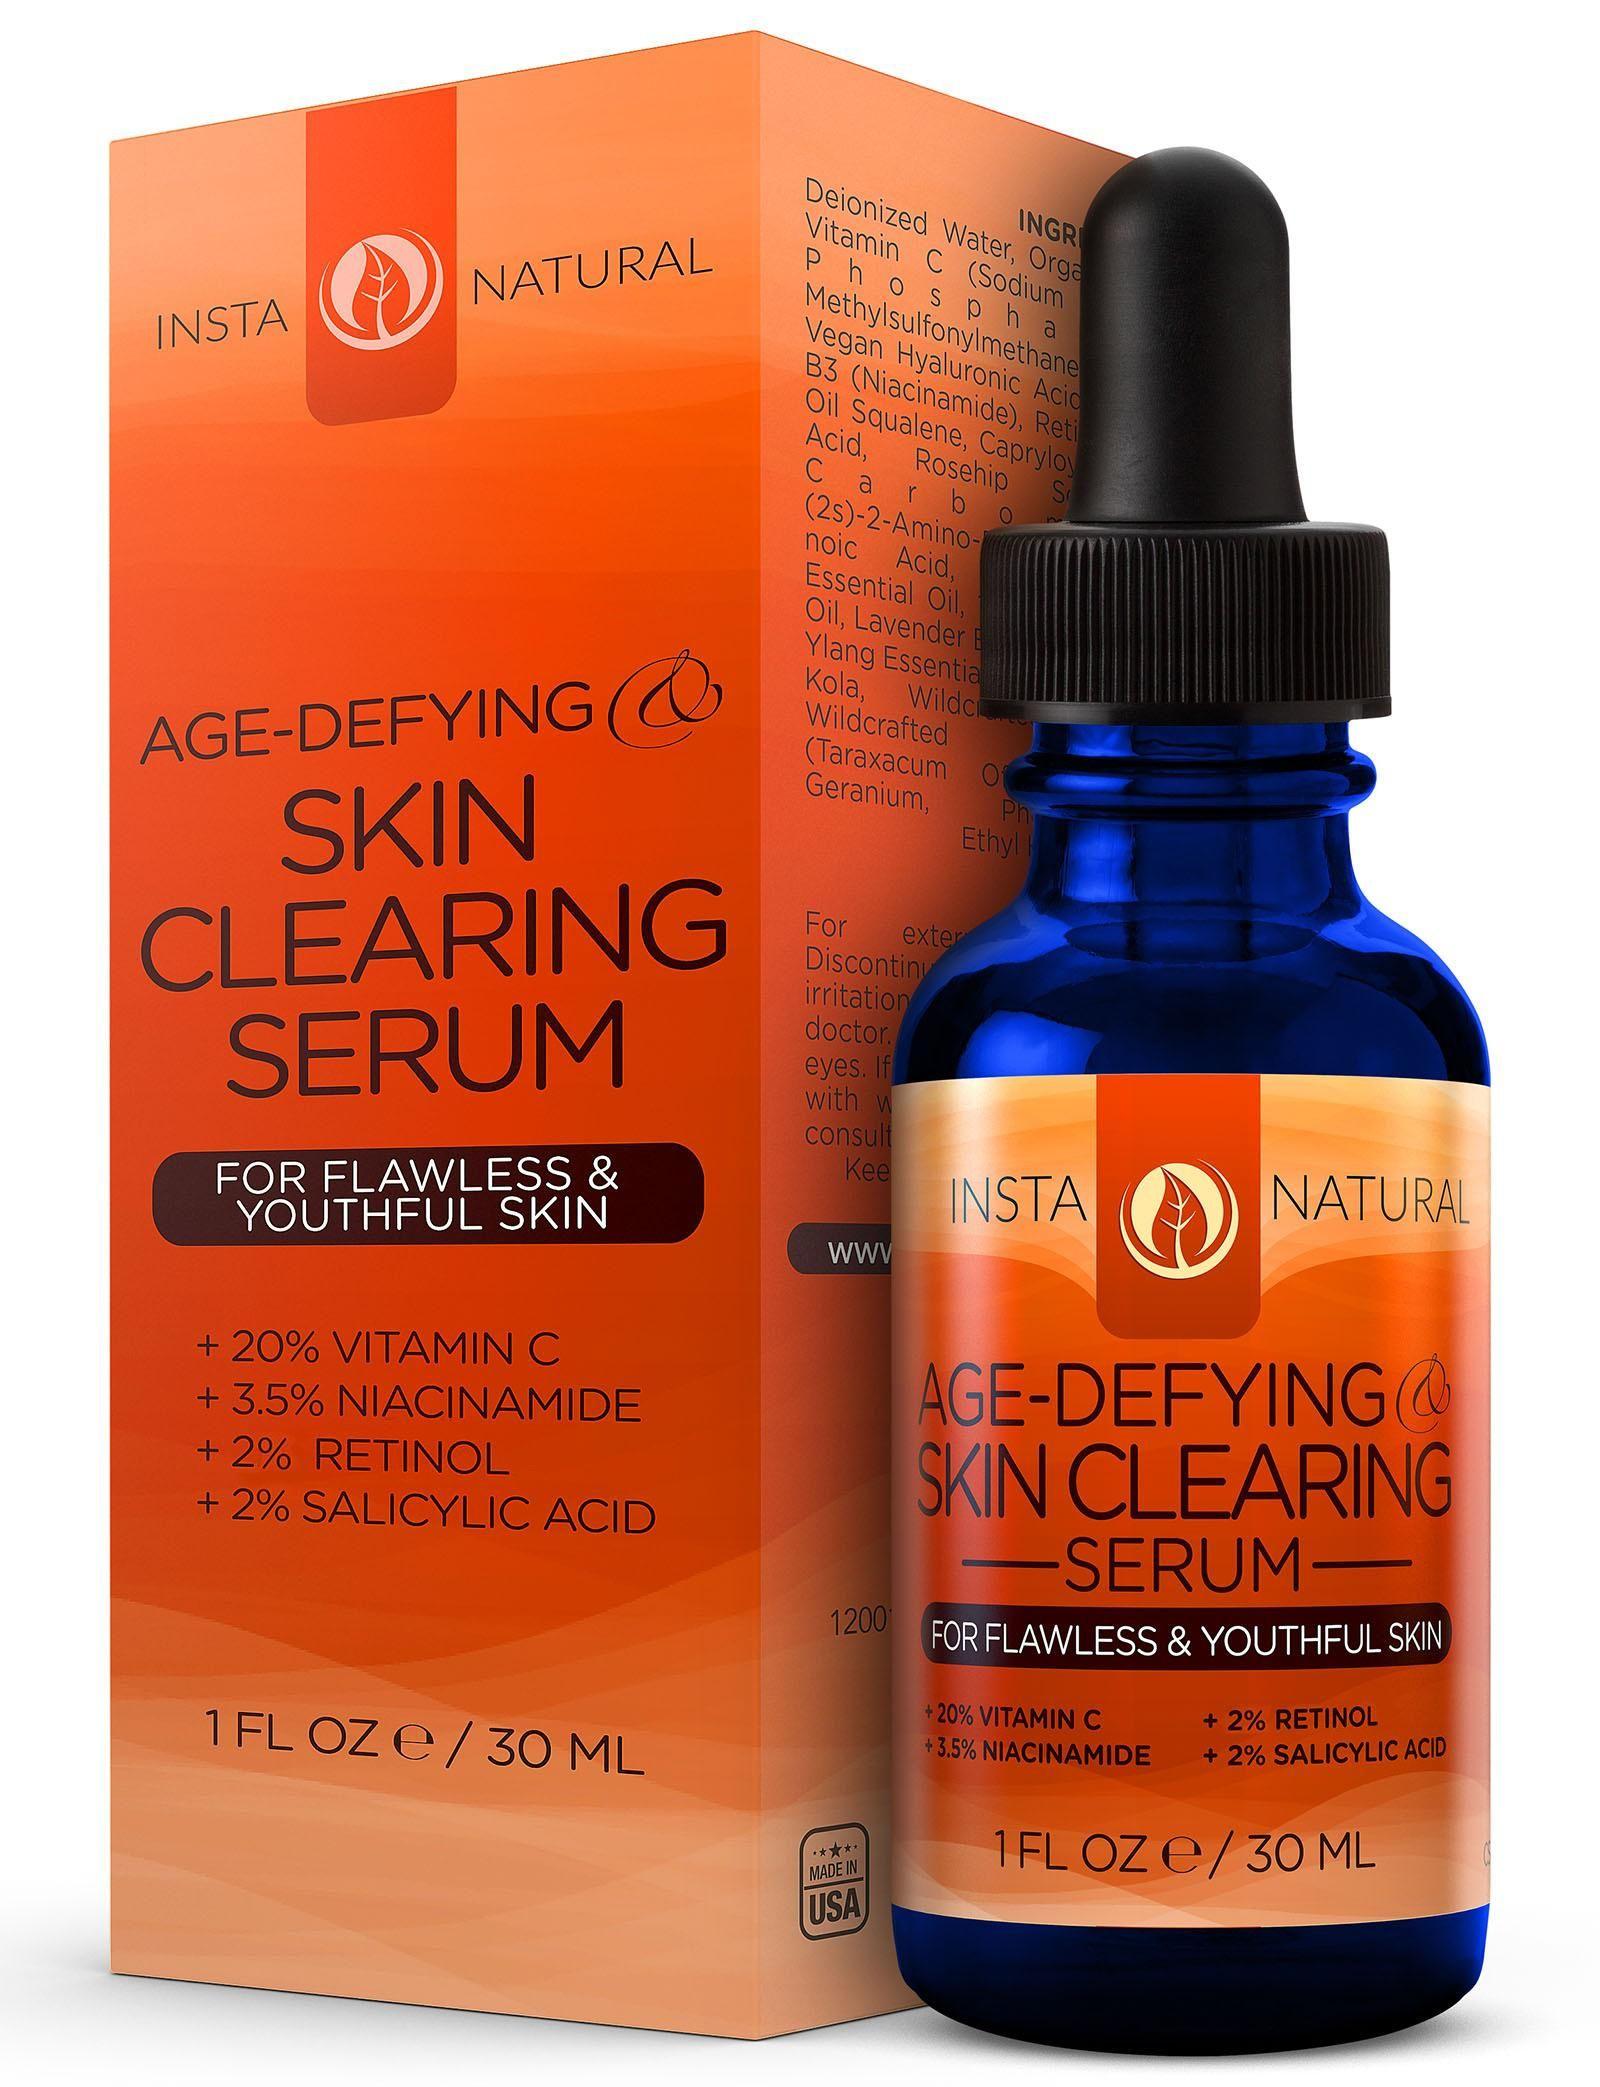 InstaNatural Vitamin C Skin Clearing Serum with Salicylic Acid for Oily Skin, 1 Oz Filorga U-SC-4914 1.7 oz Sleep-Recover Anti-Fatigue Night Balm